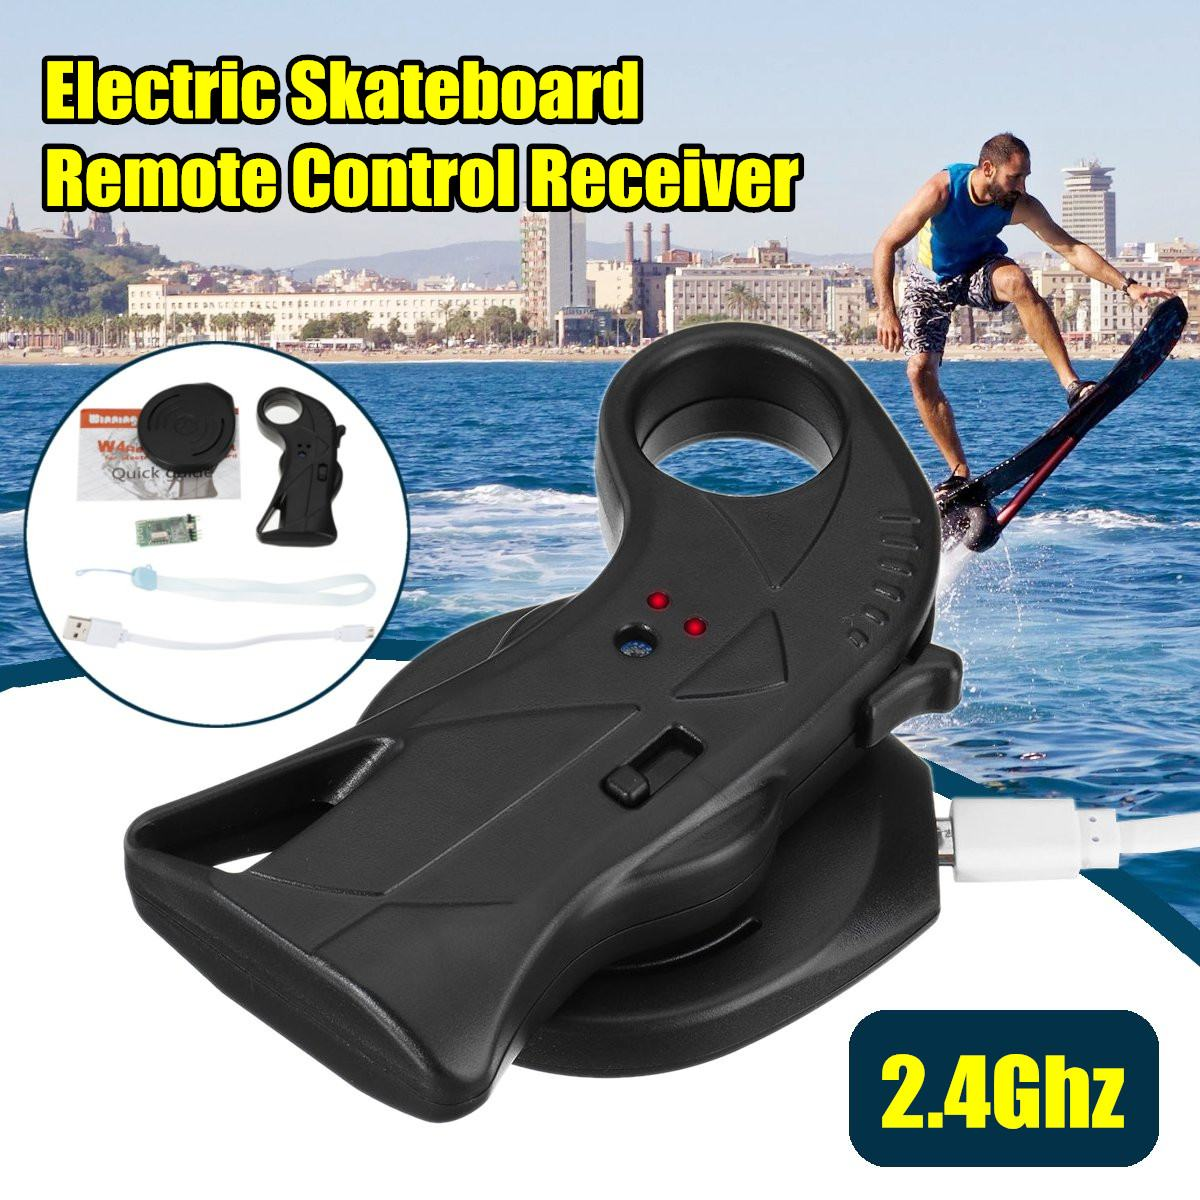 2.4 2.4ghz の電気スケートボードリモコン受信機とユニバーサルのためのロングボードスケートボードスクーター防水  グループ上の スポーツ & エンターテイメント からの スケートボード の中 1